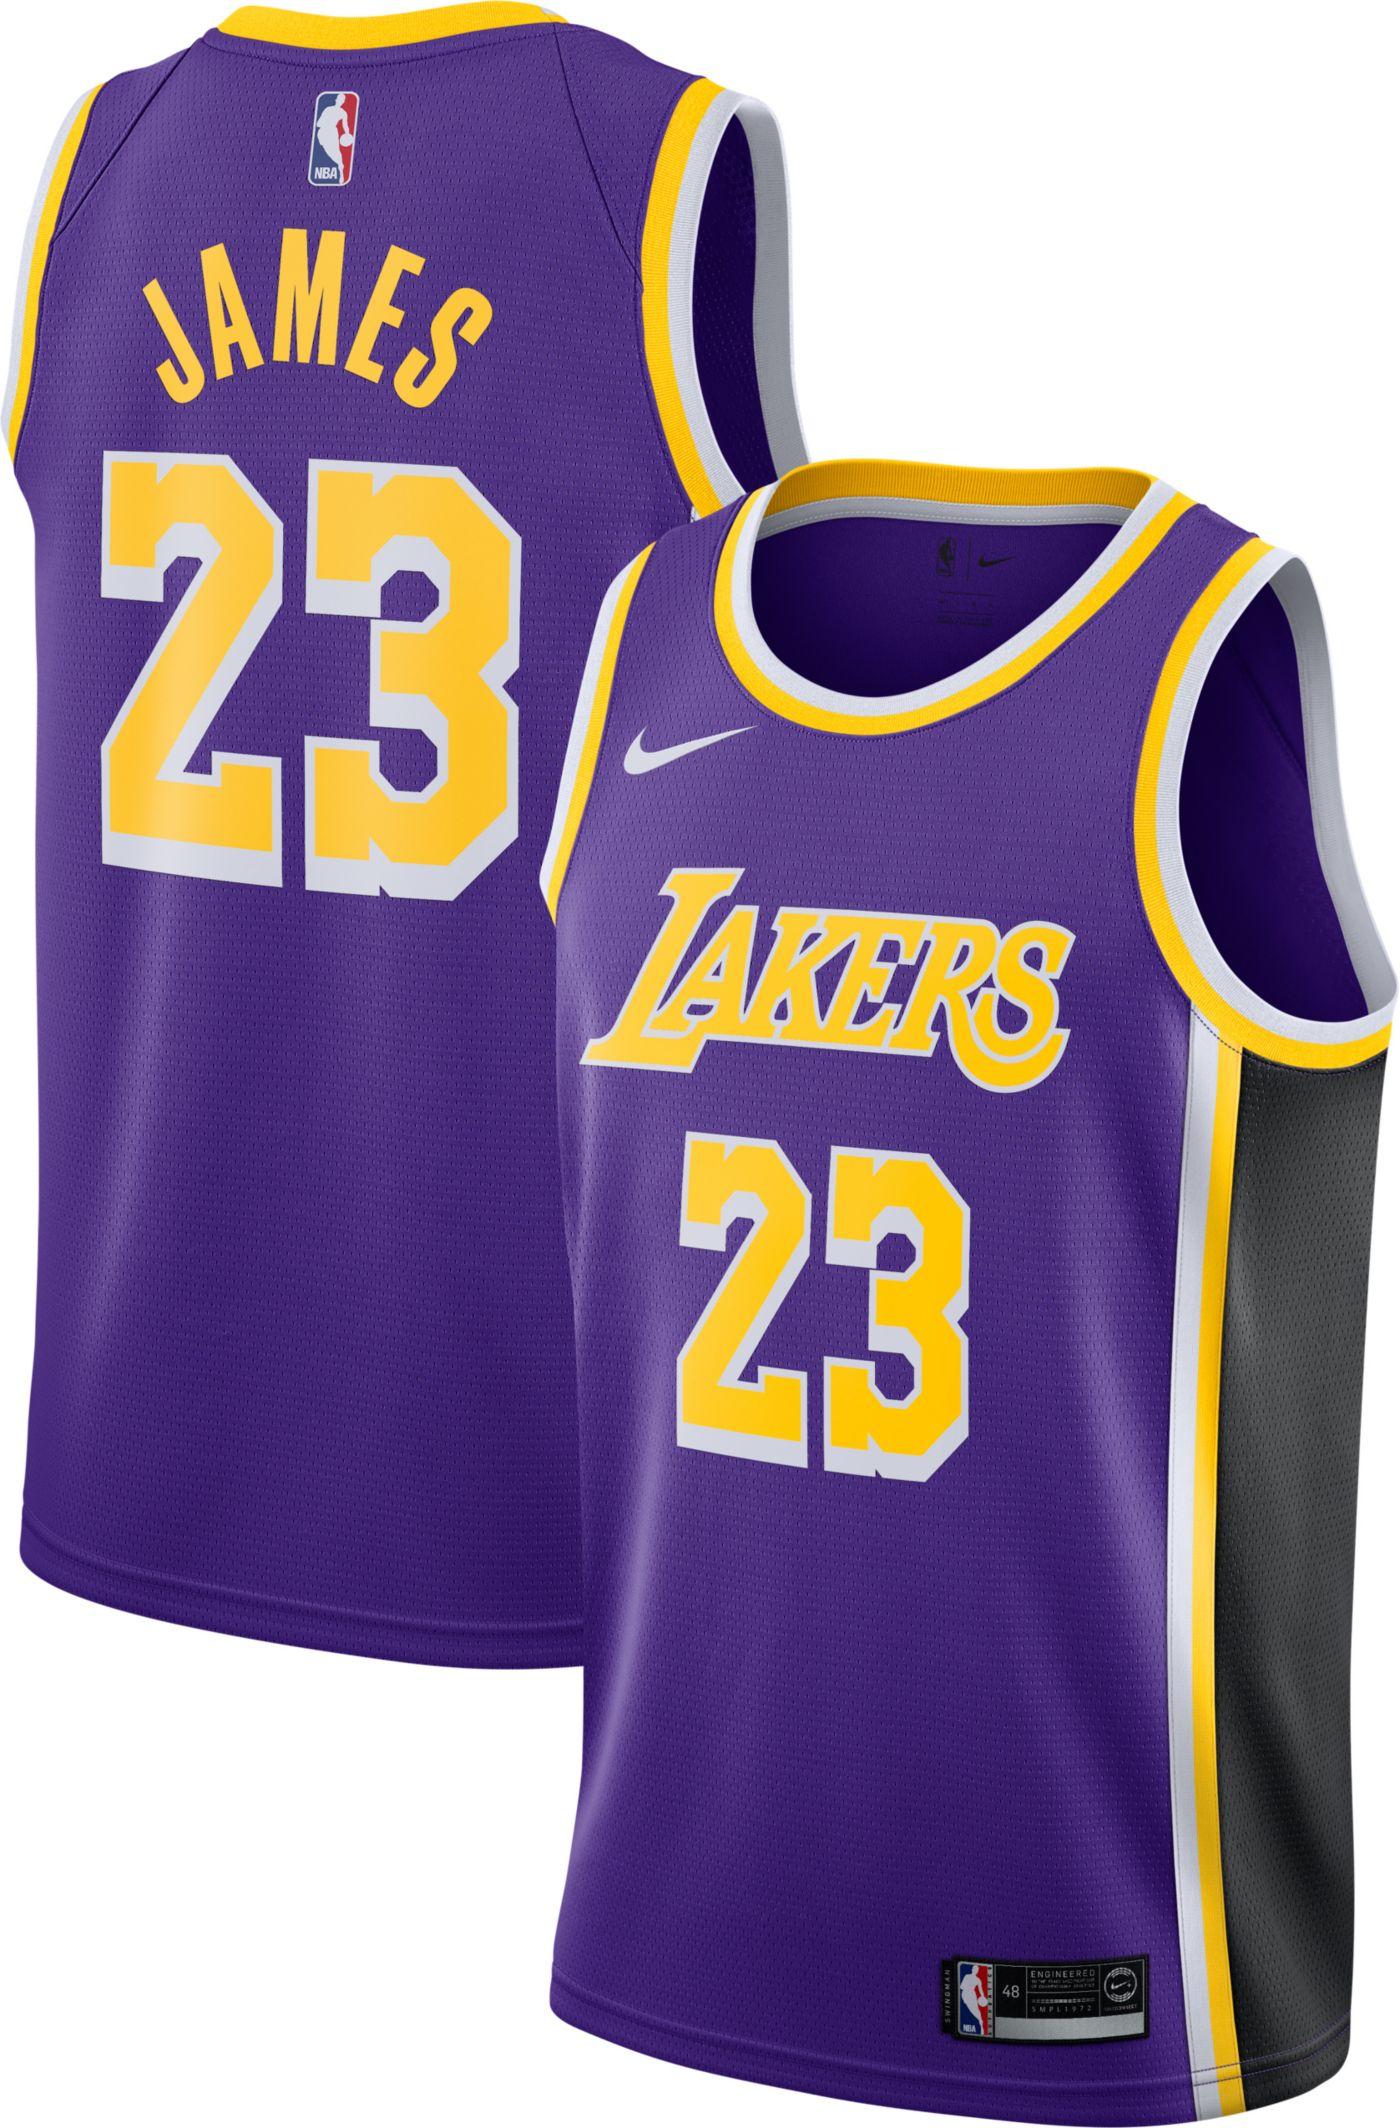 Nike Men's Los Angeles Lakers LeBron James #23 Purple Dri-FIT Statement Swingman Jersey